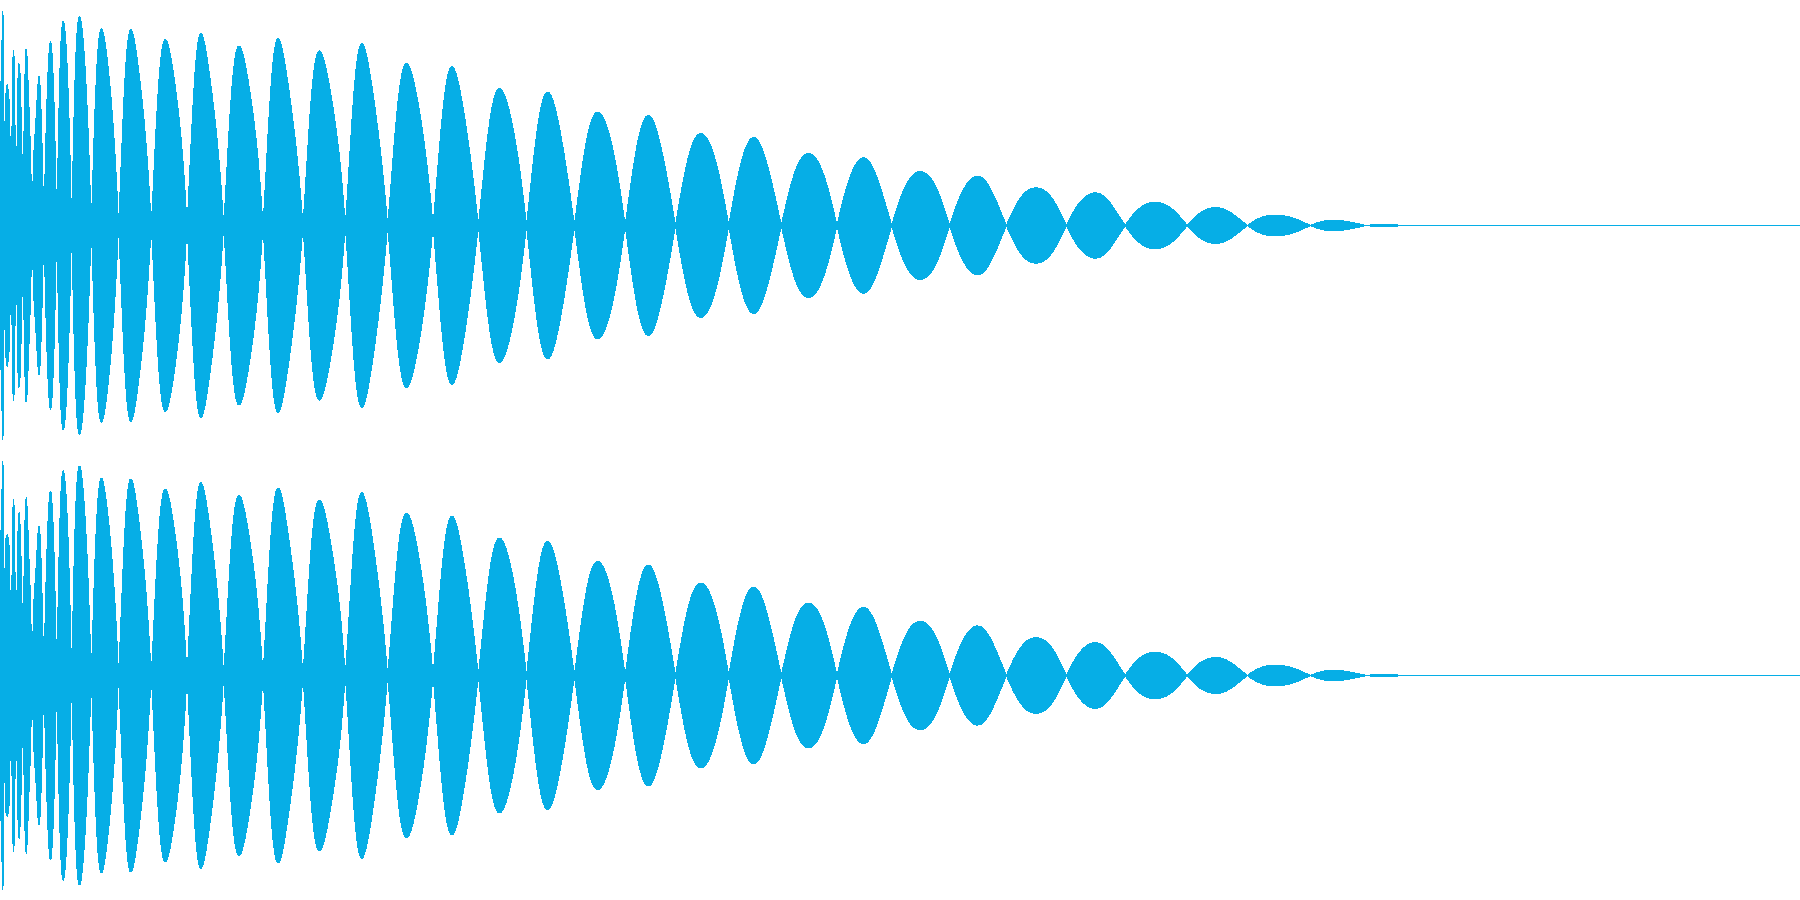 DTM Kick 84 オリジナル音源の再生済みの波形